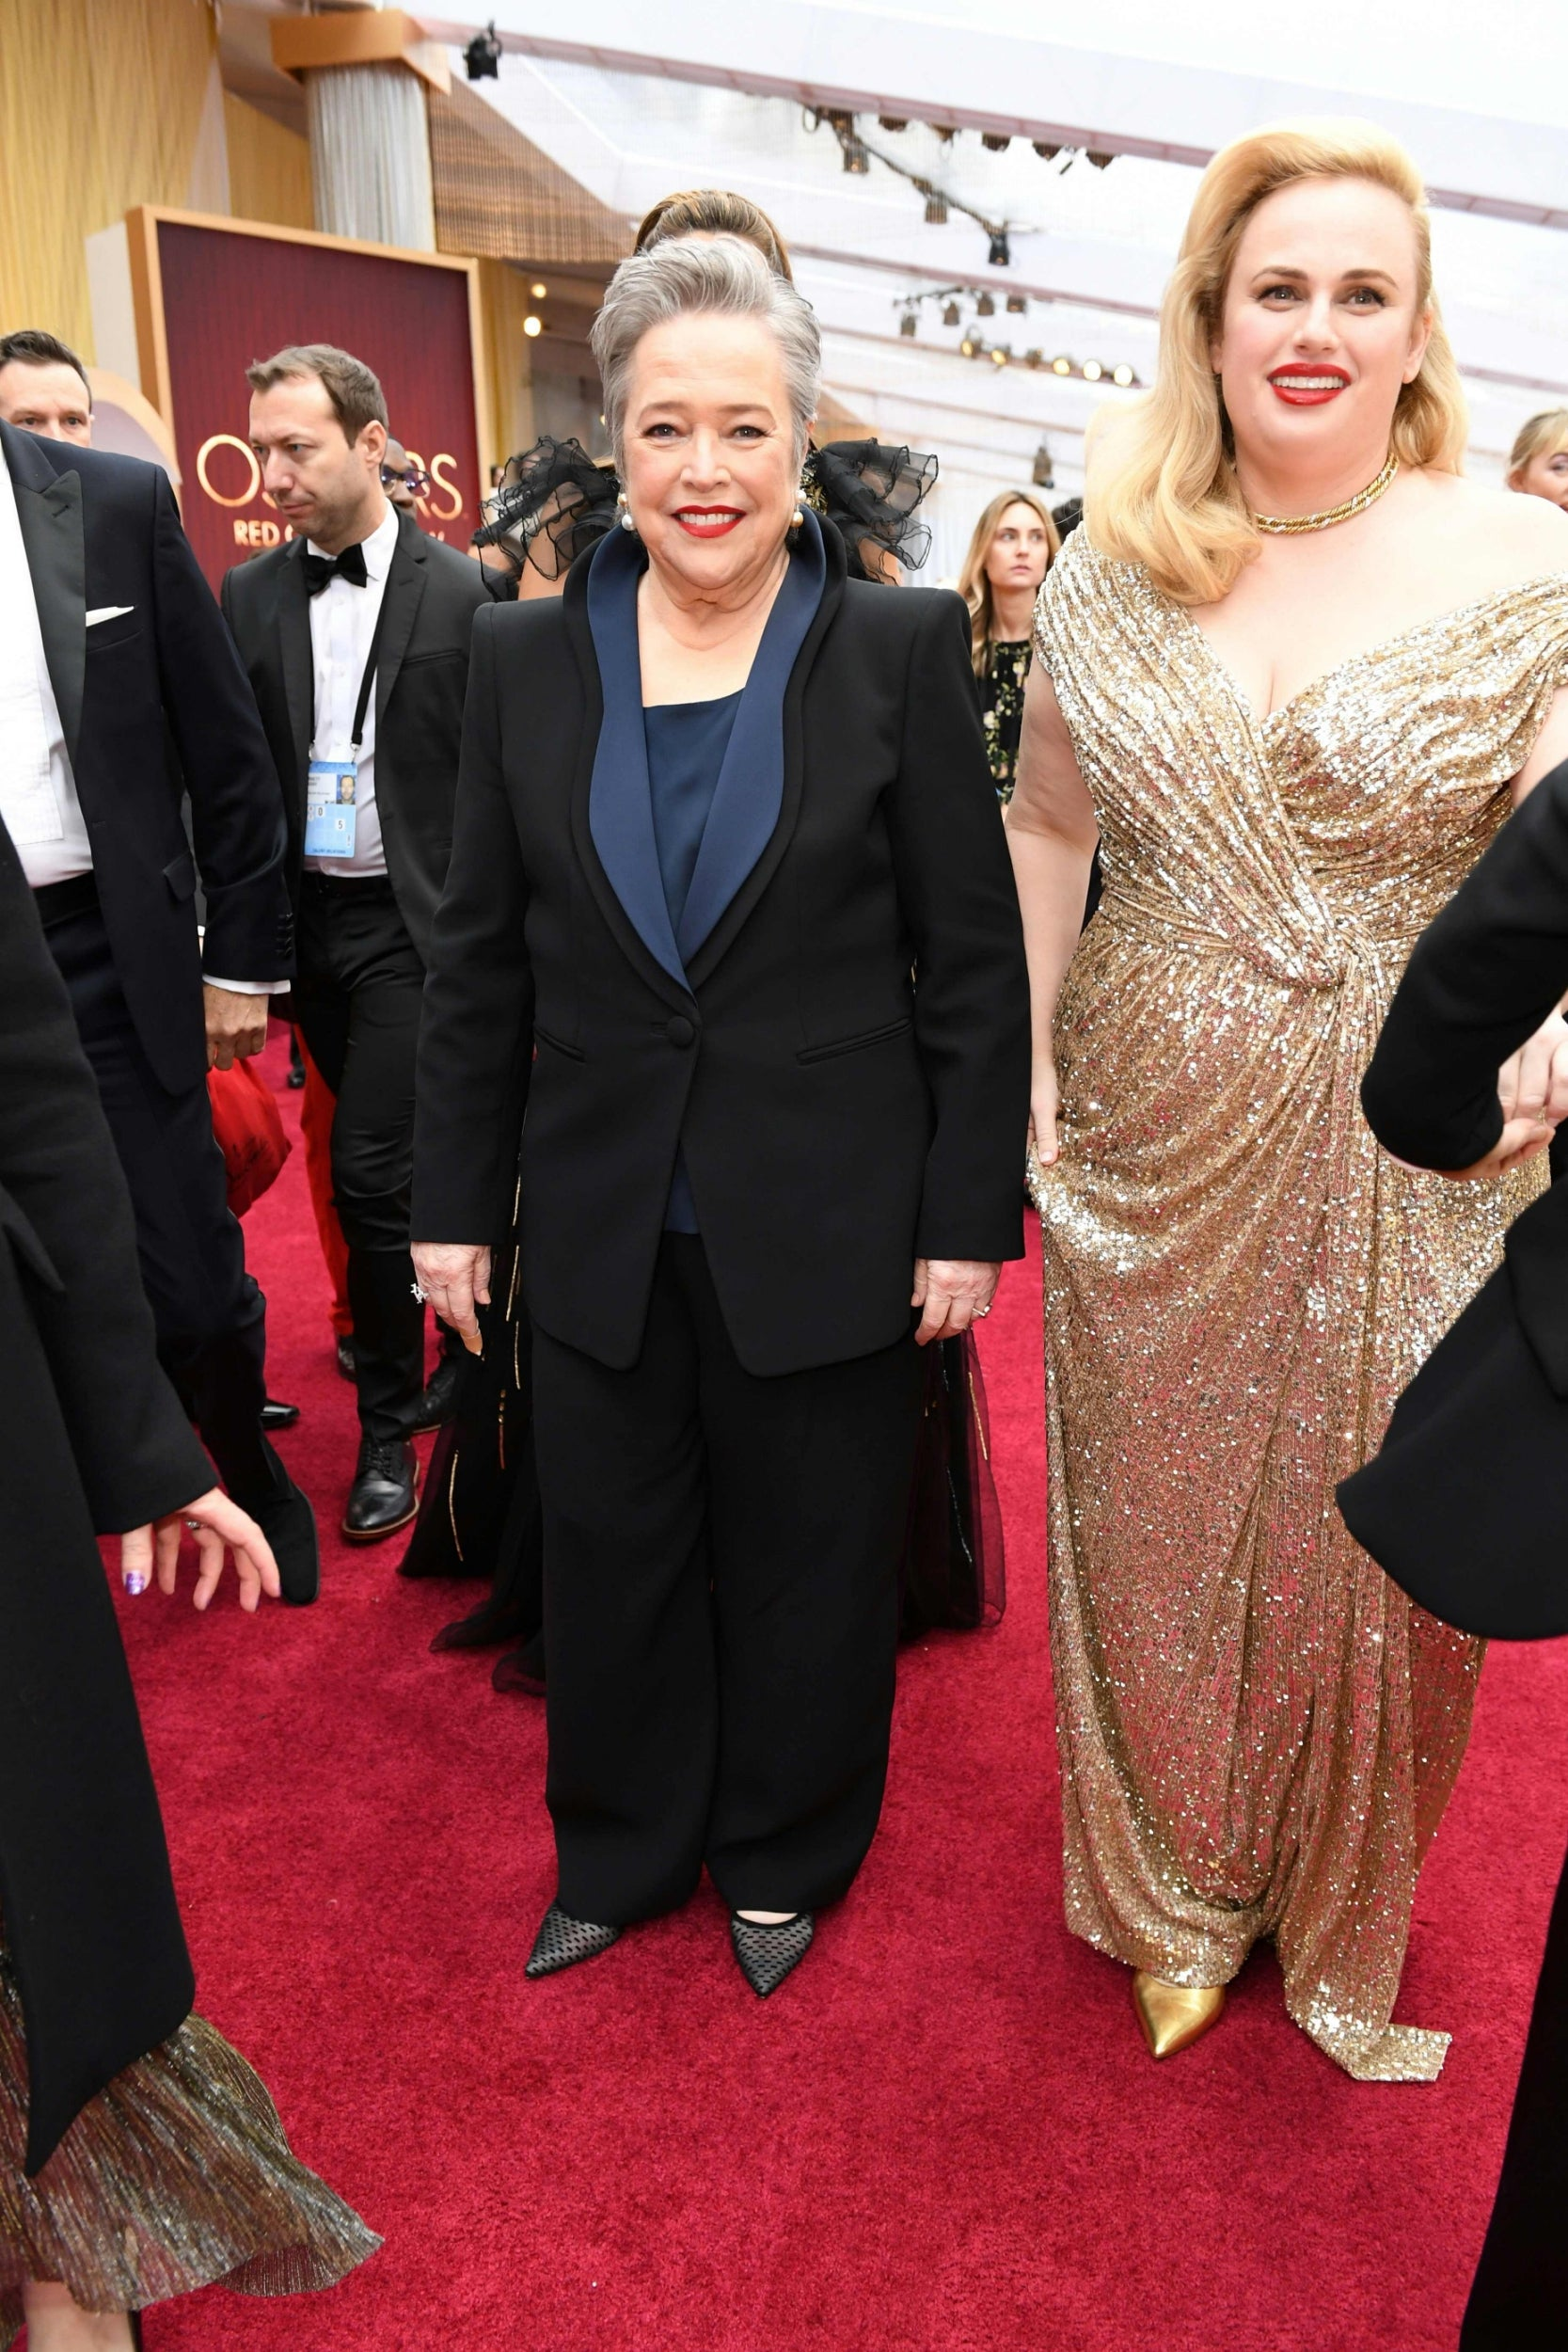 Kathy Bates and Rebel Wilson